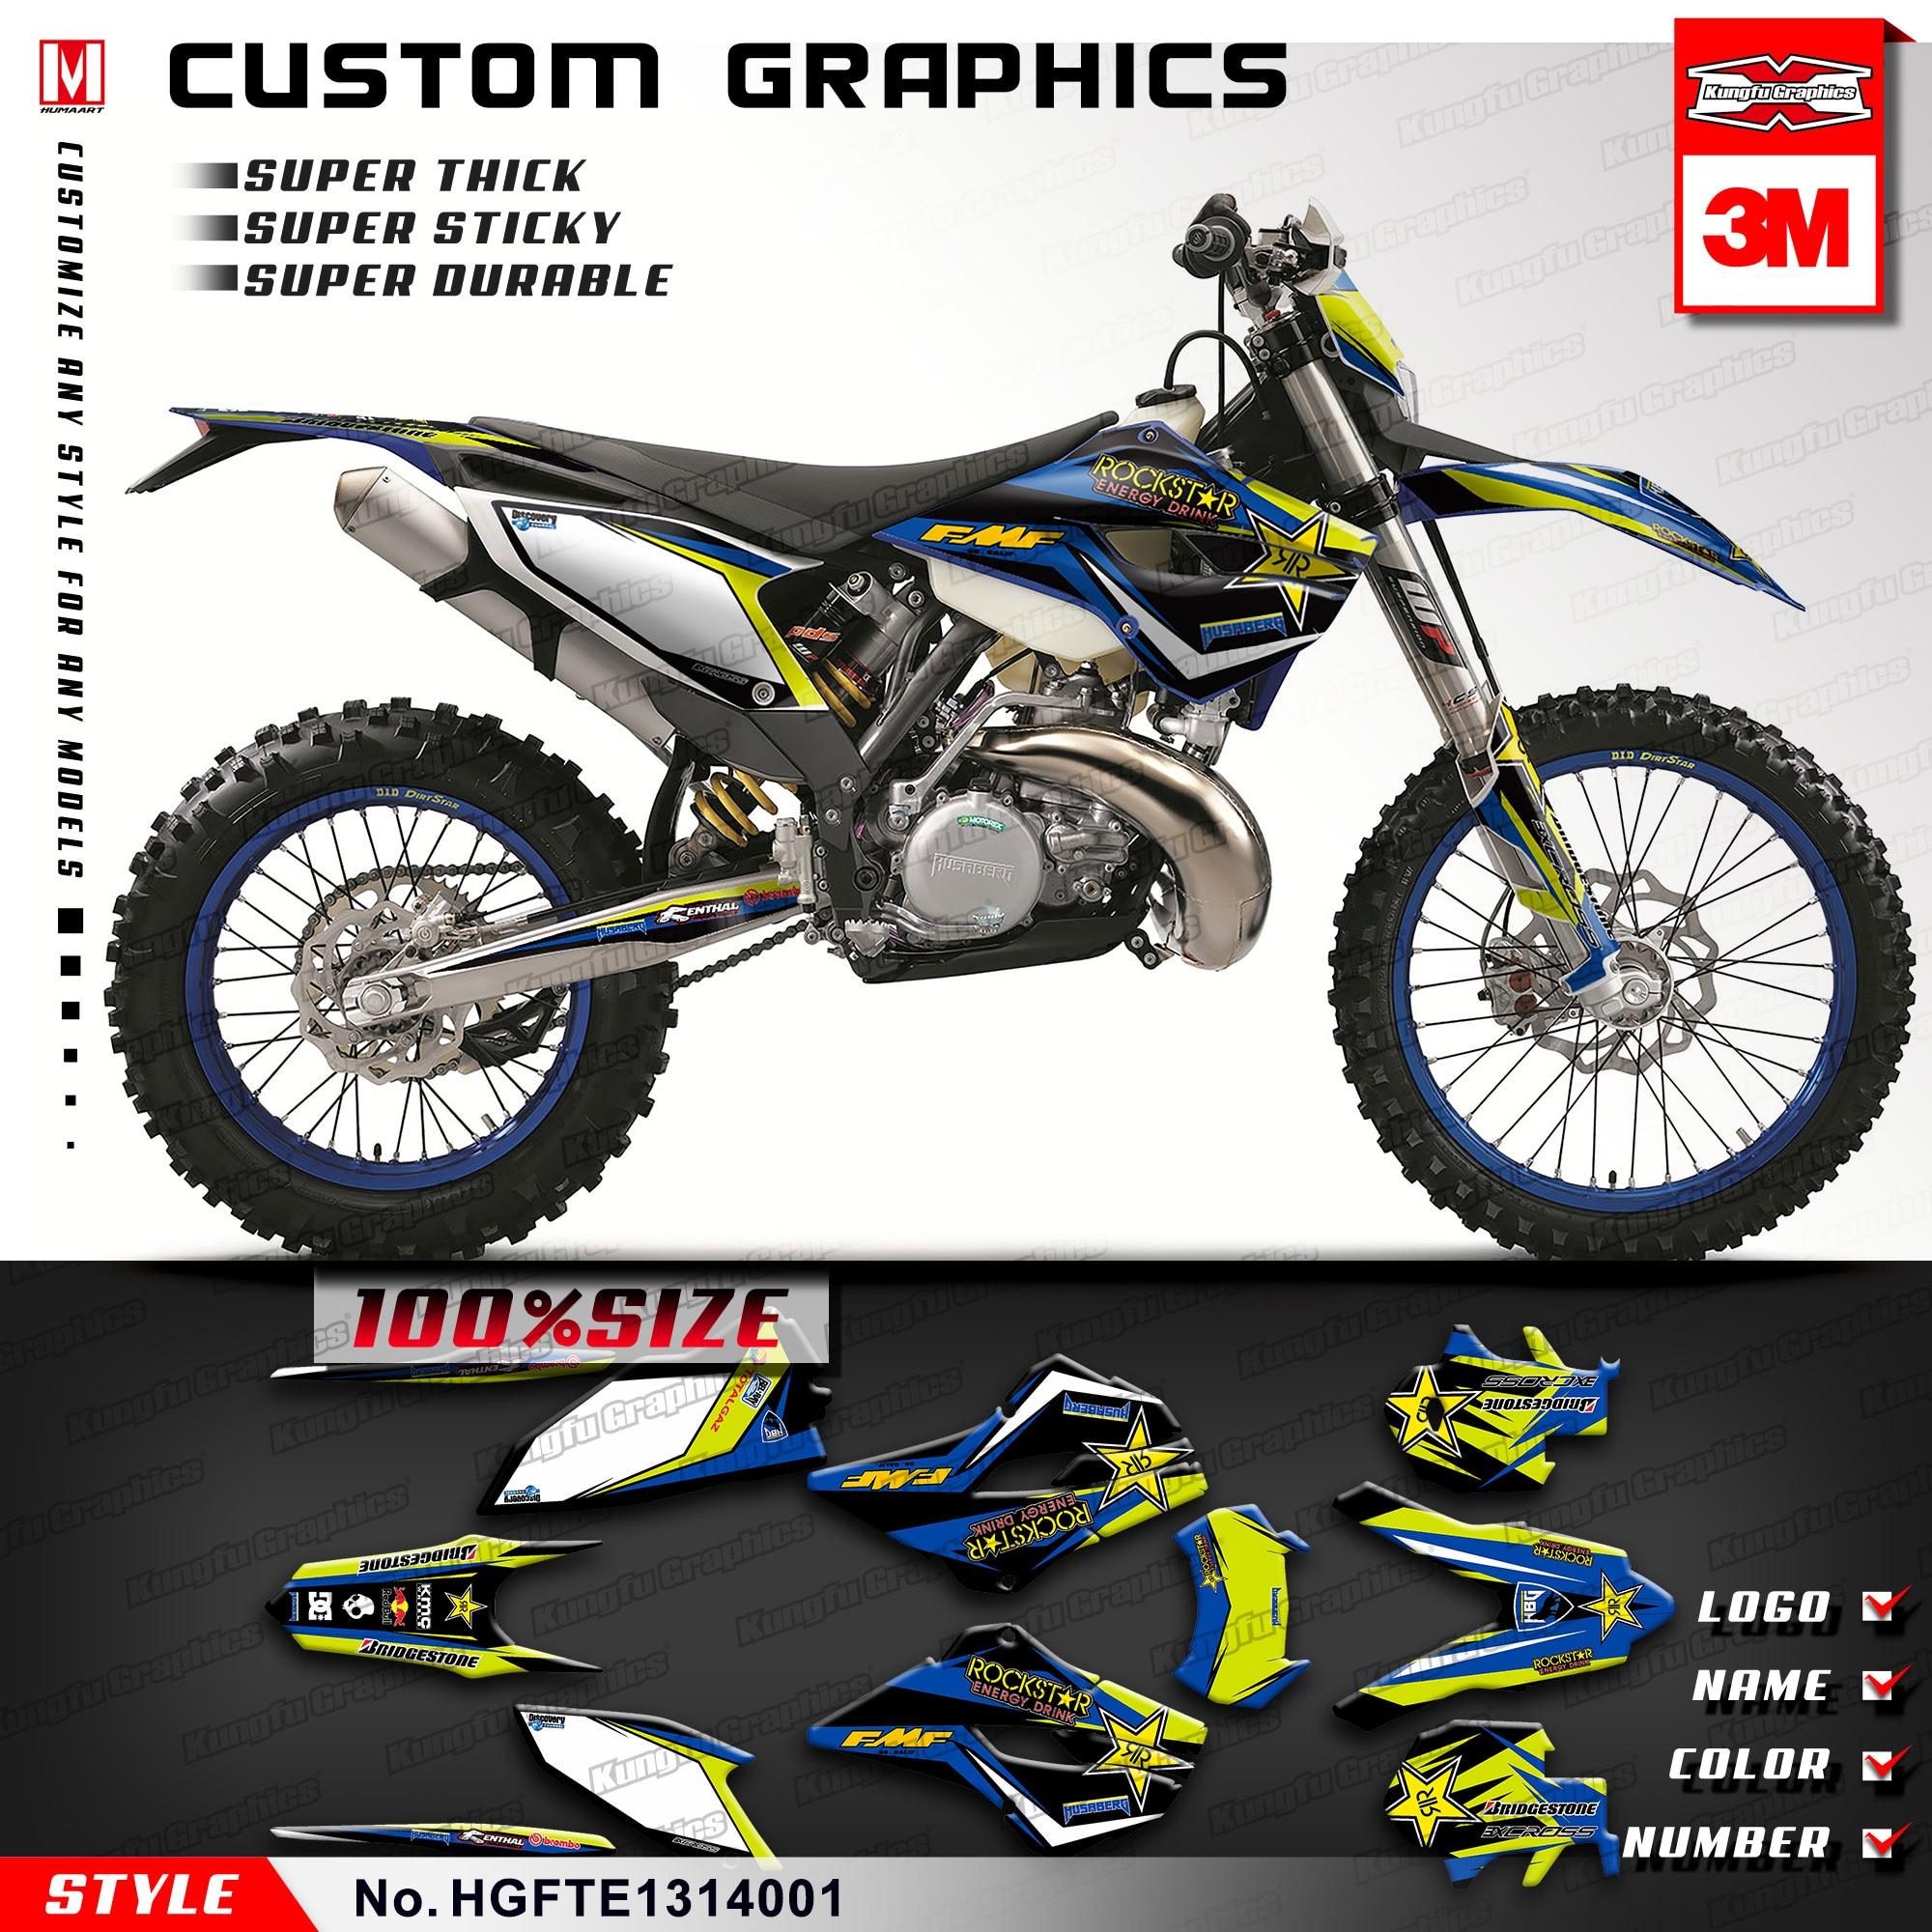 Grey Kungfu Graphics Custom Decal Kit for Husqvarna TE FE 125 250 300 350 450 501 2017 2018 2019